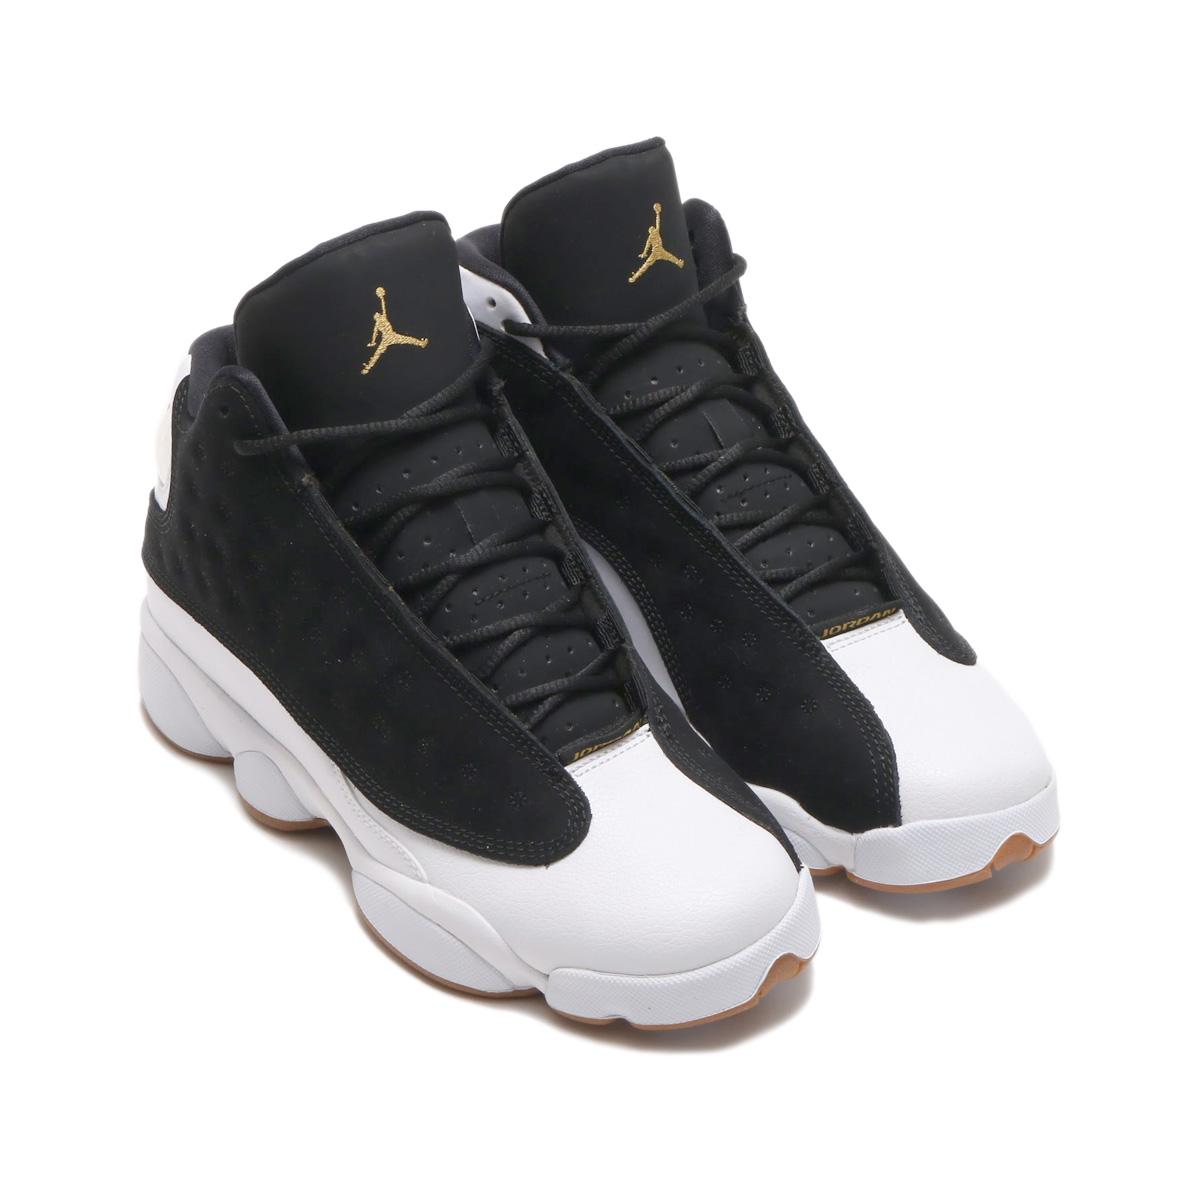 NIKE AIR JORDAN RETRO 13 GG (Nike girls Air Jordan 13 nostalgic GG) (BLACK METALLIC  GOLD-WHITE-GUM MED BROWN)18SP-S eb472626f728